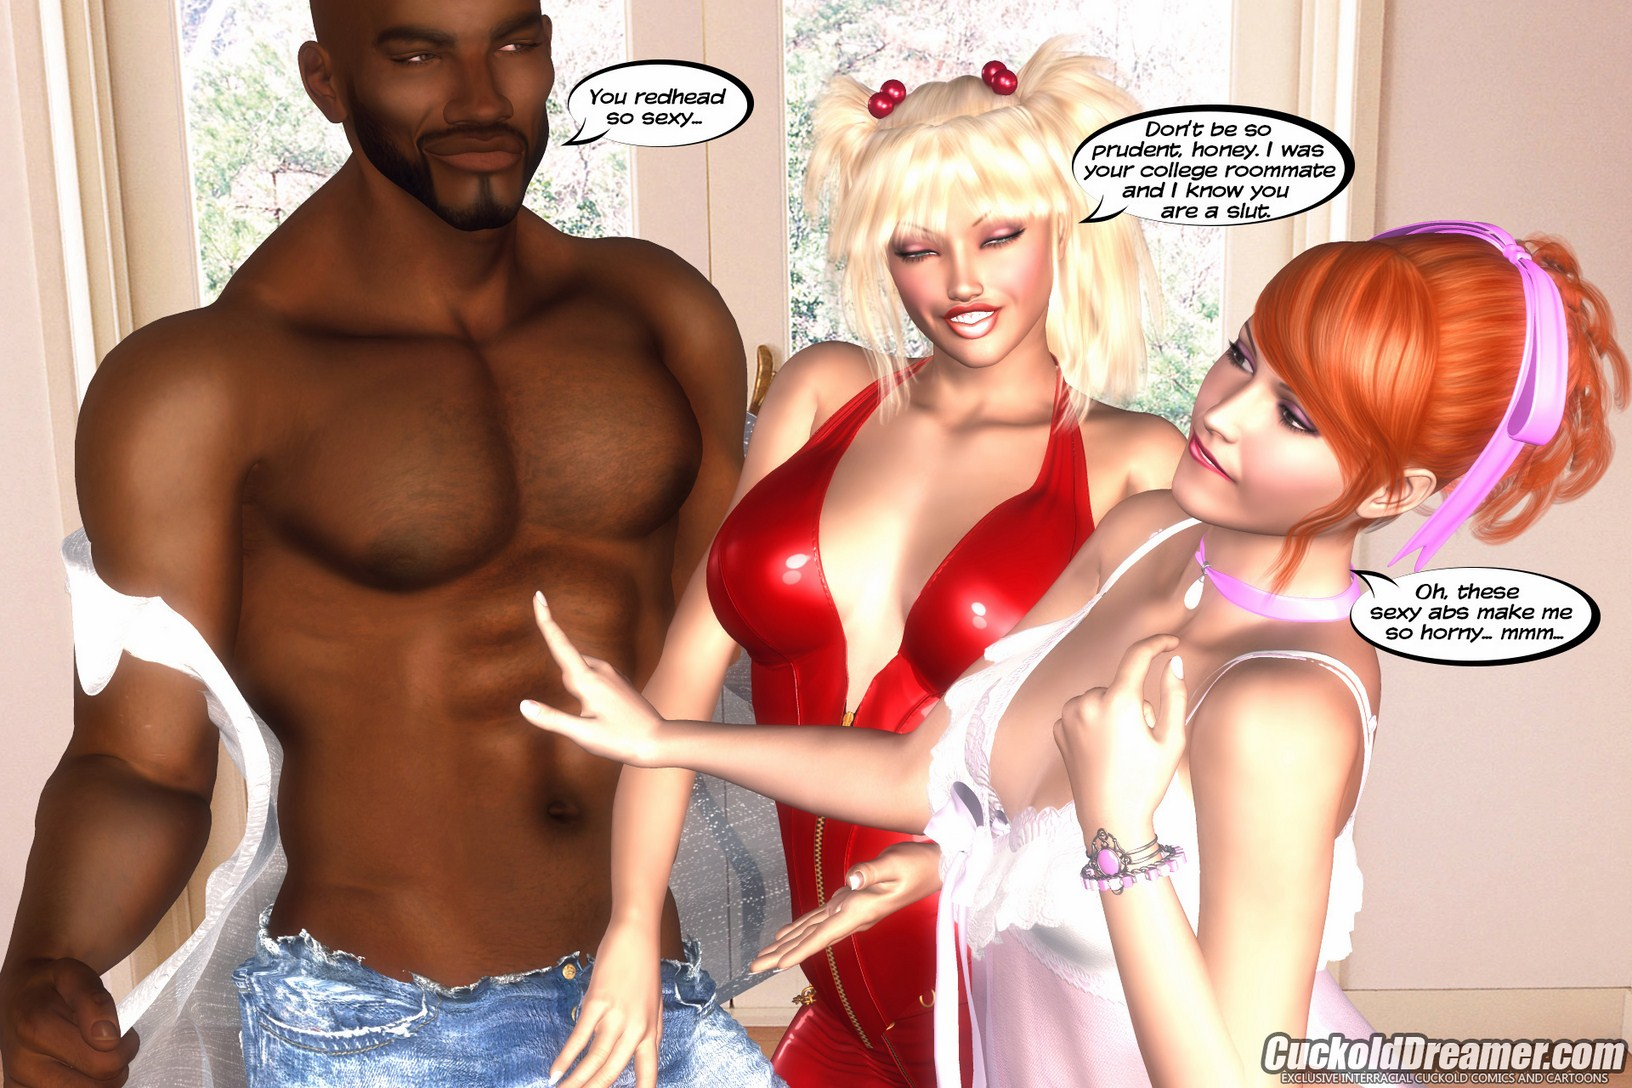 Cartoon xxx srxing vido dowlode naked pic